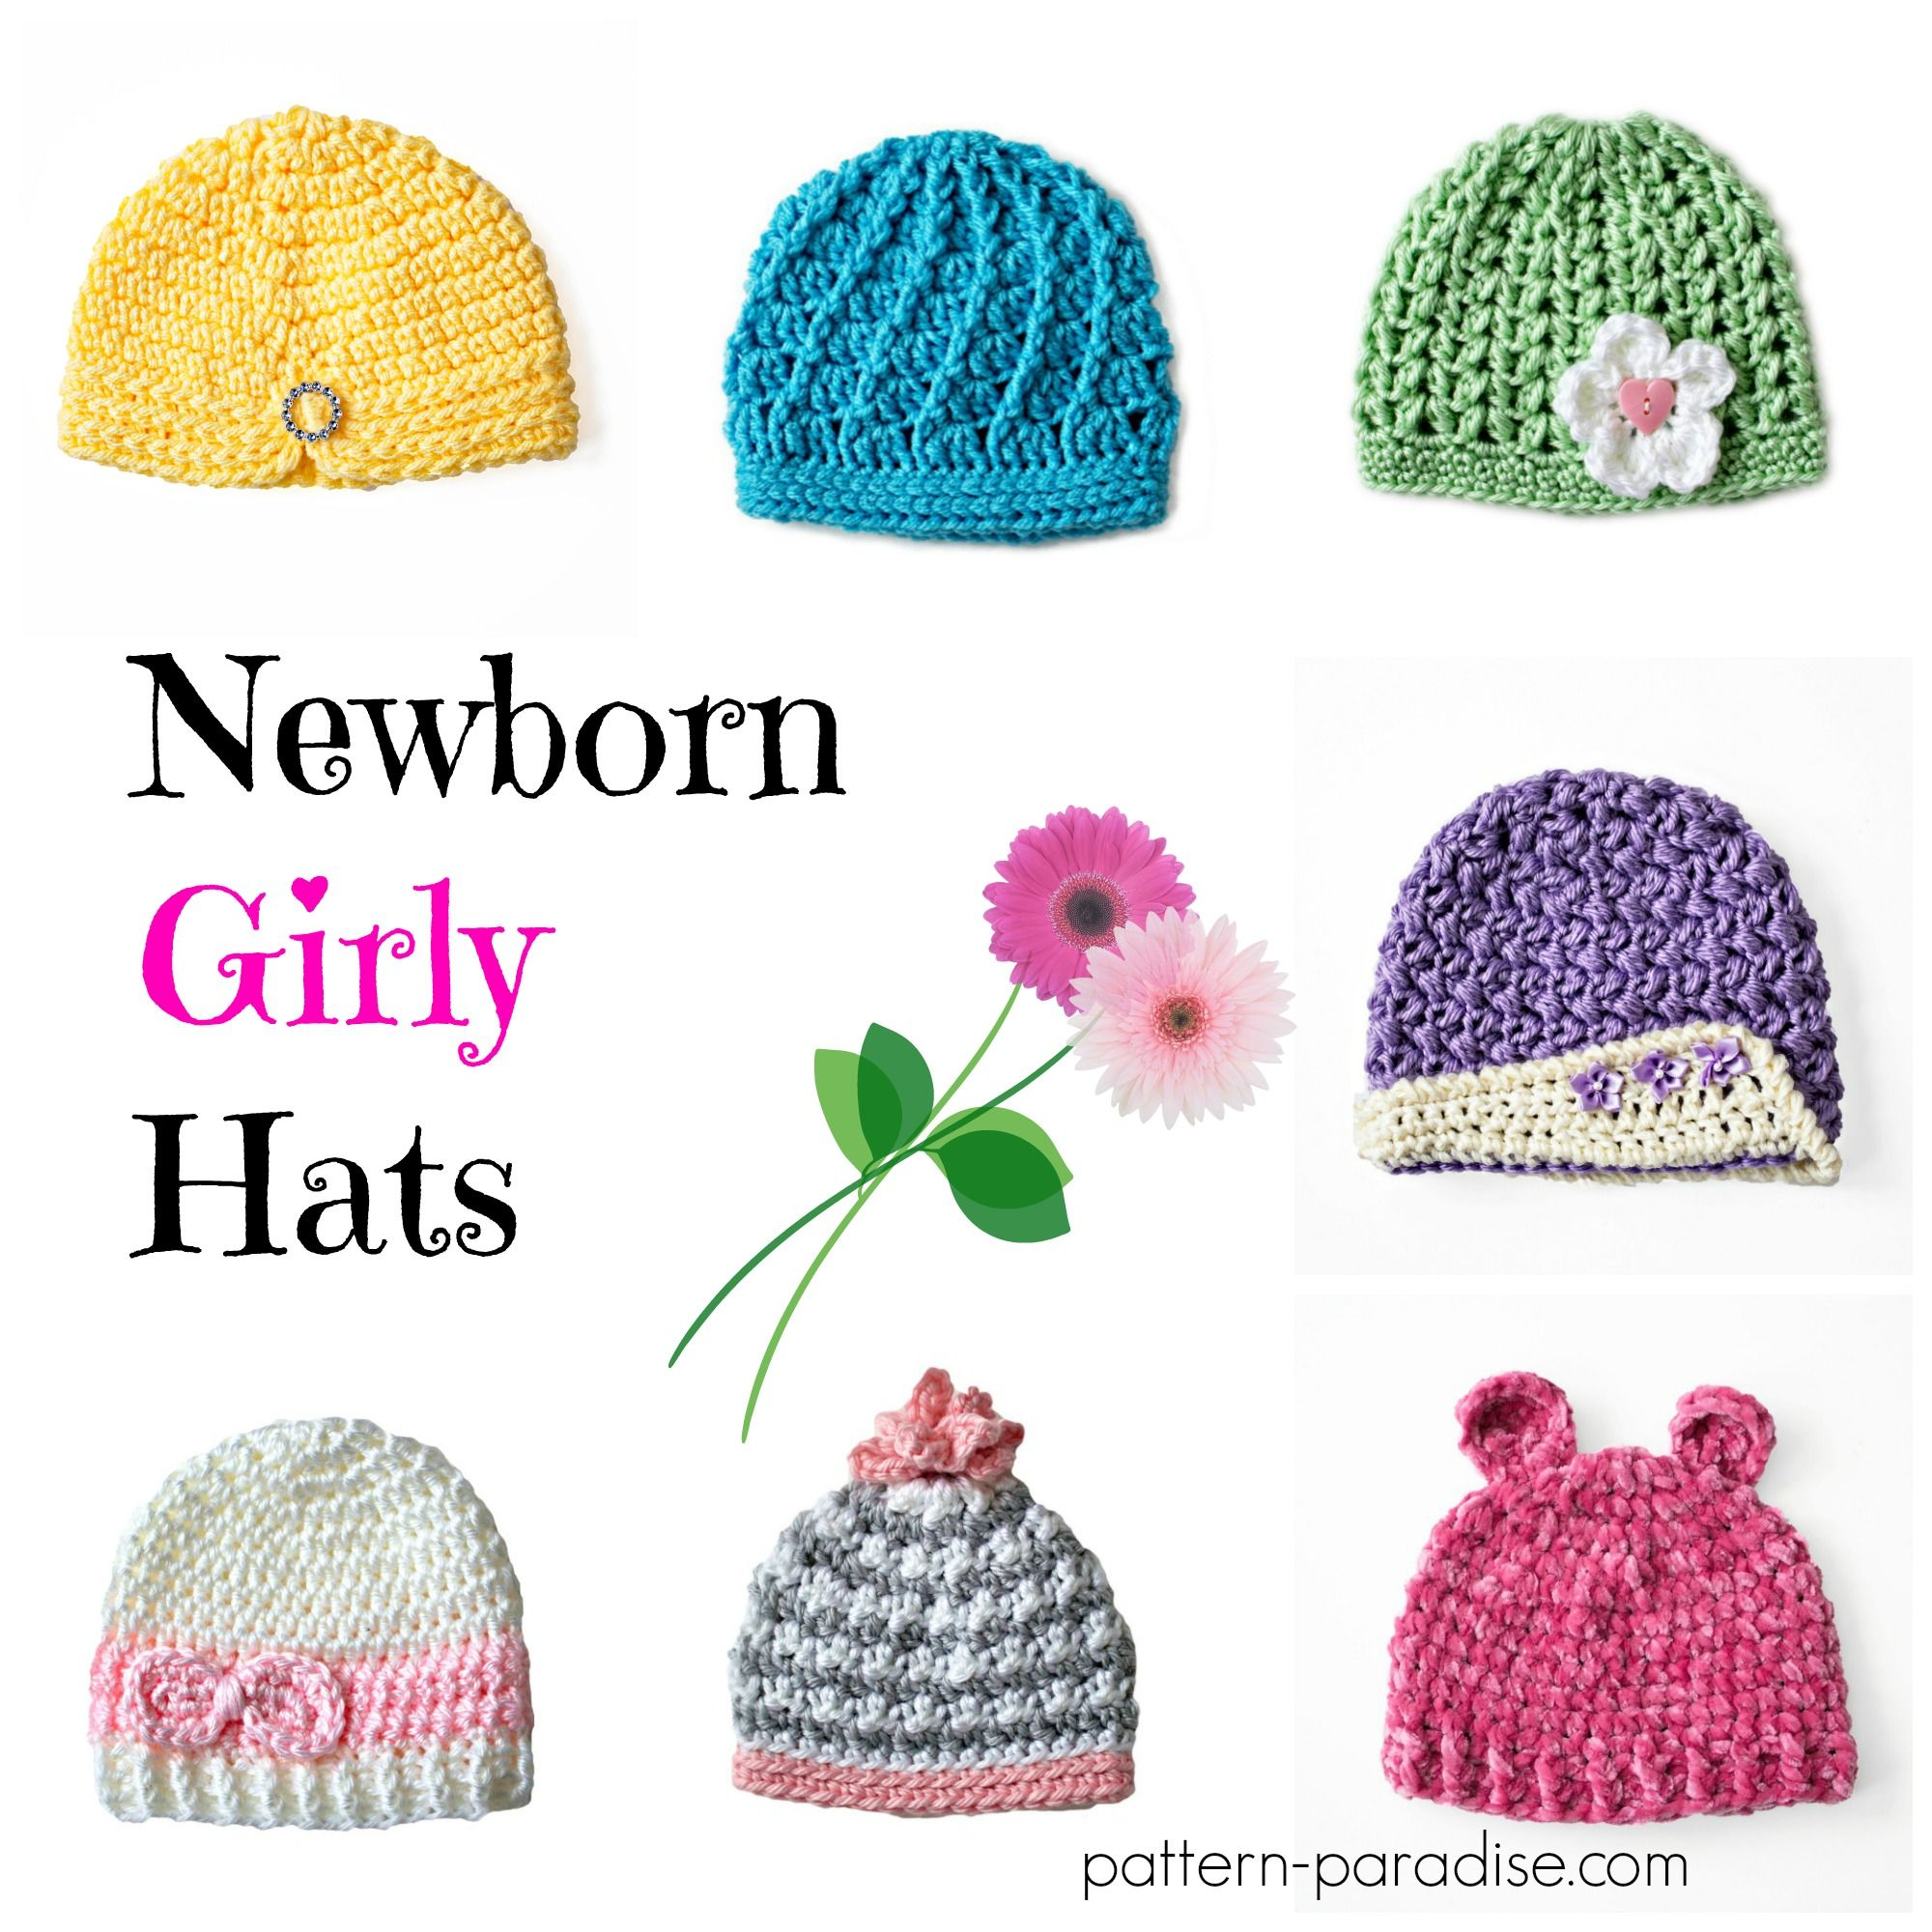 Crochet Pattern: Newborn Girly Hats | Newborn hats, Crochet and Patterns